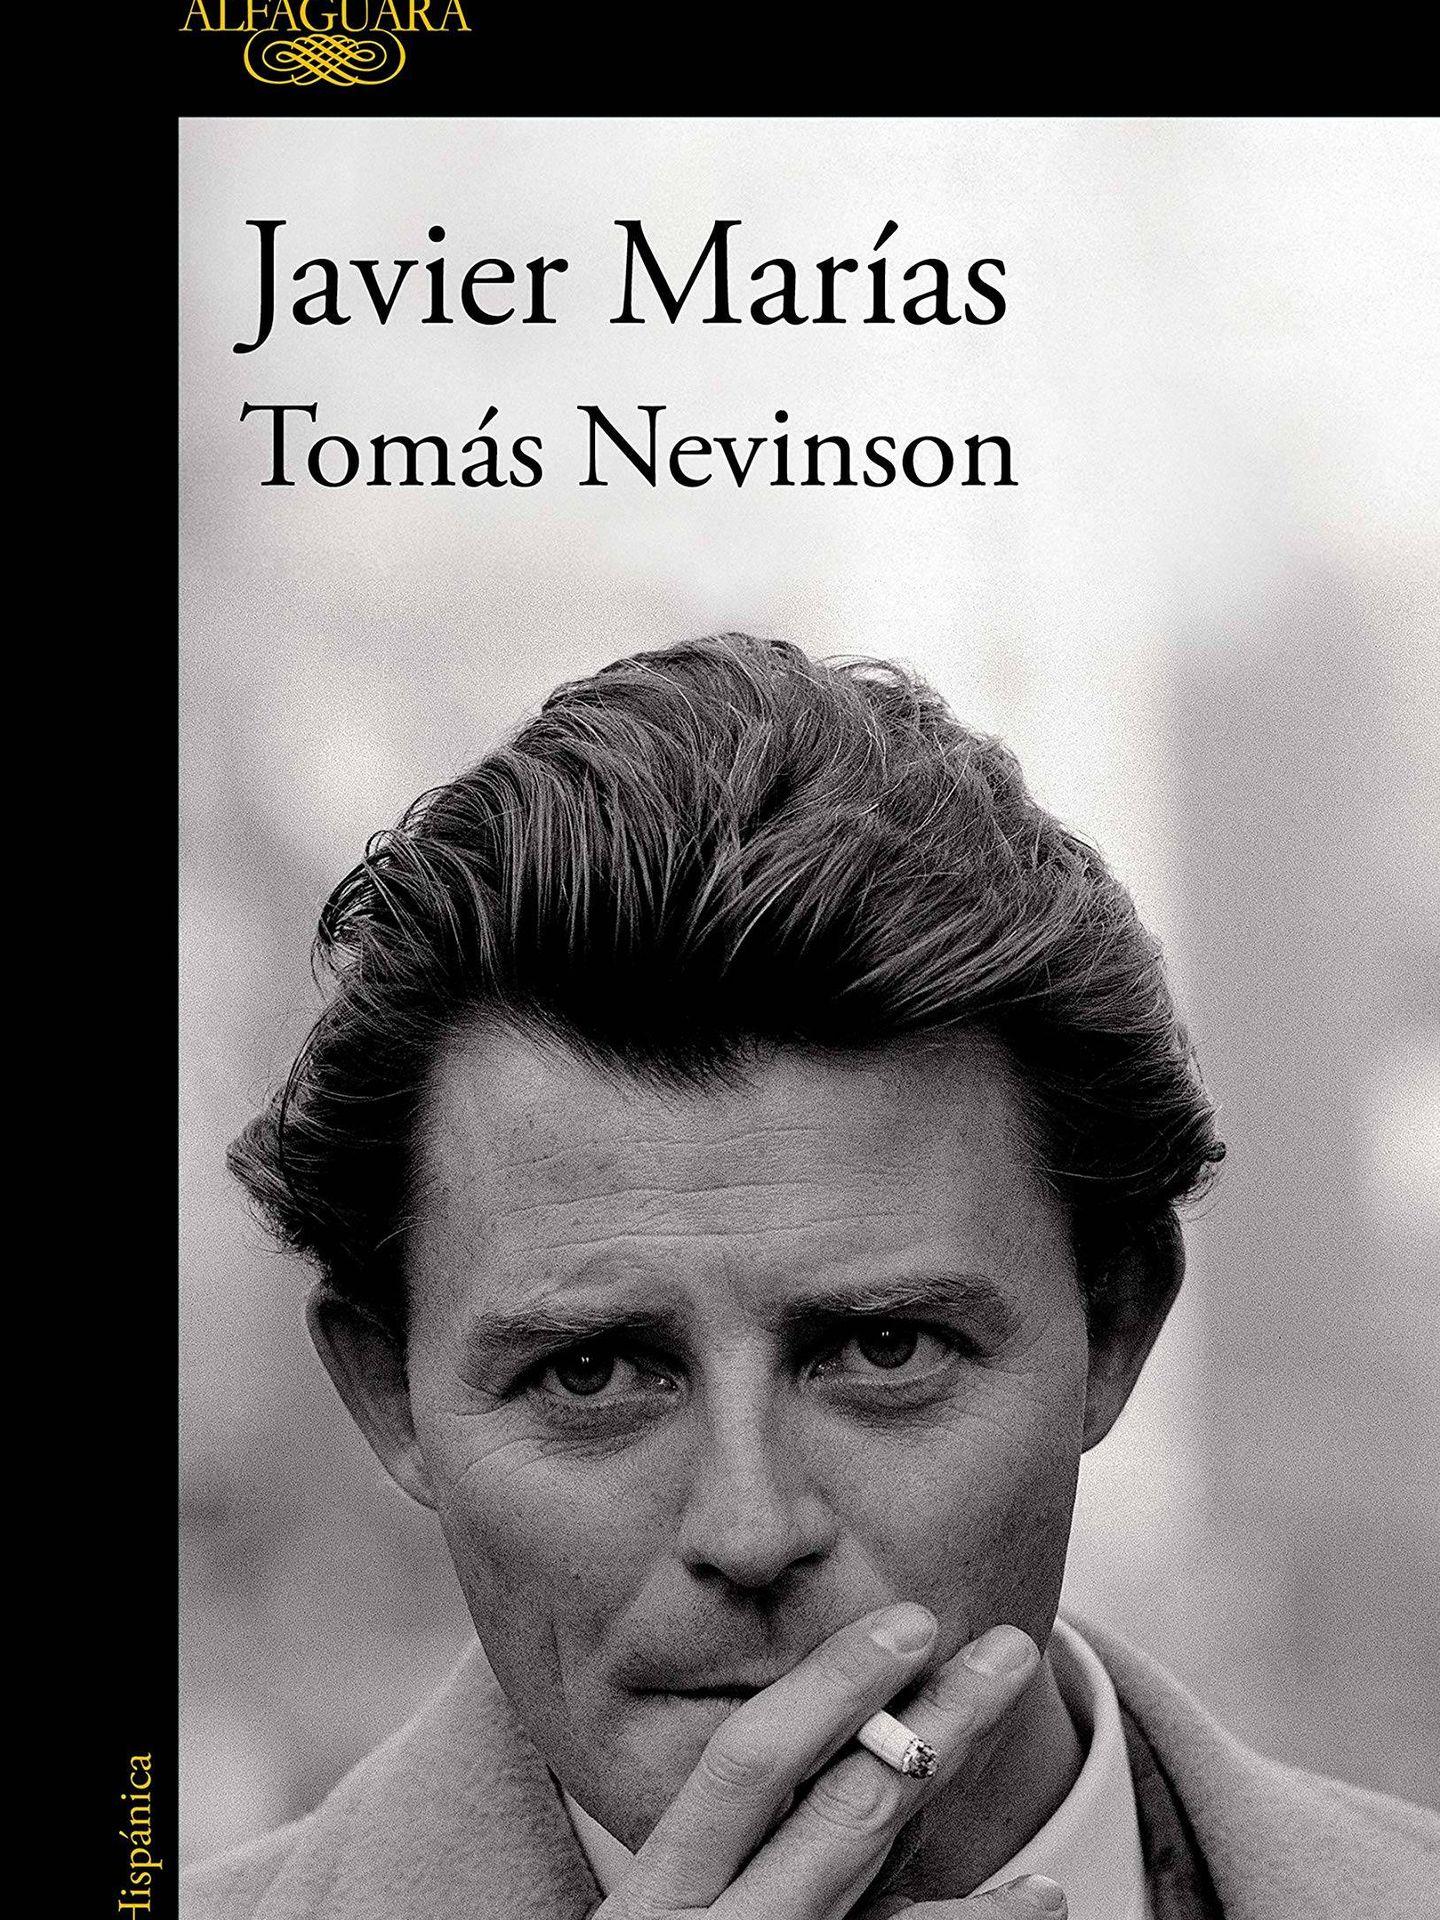 'Tomas Nevinson' (Alfaguara).